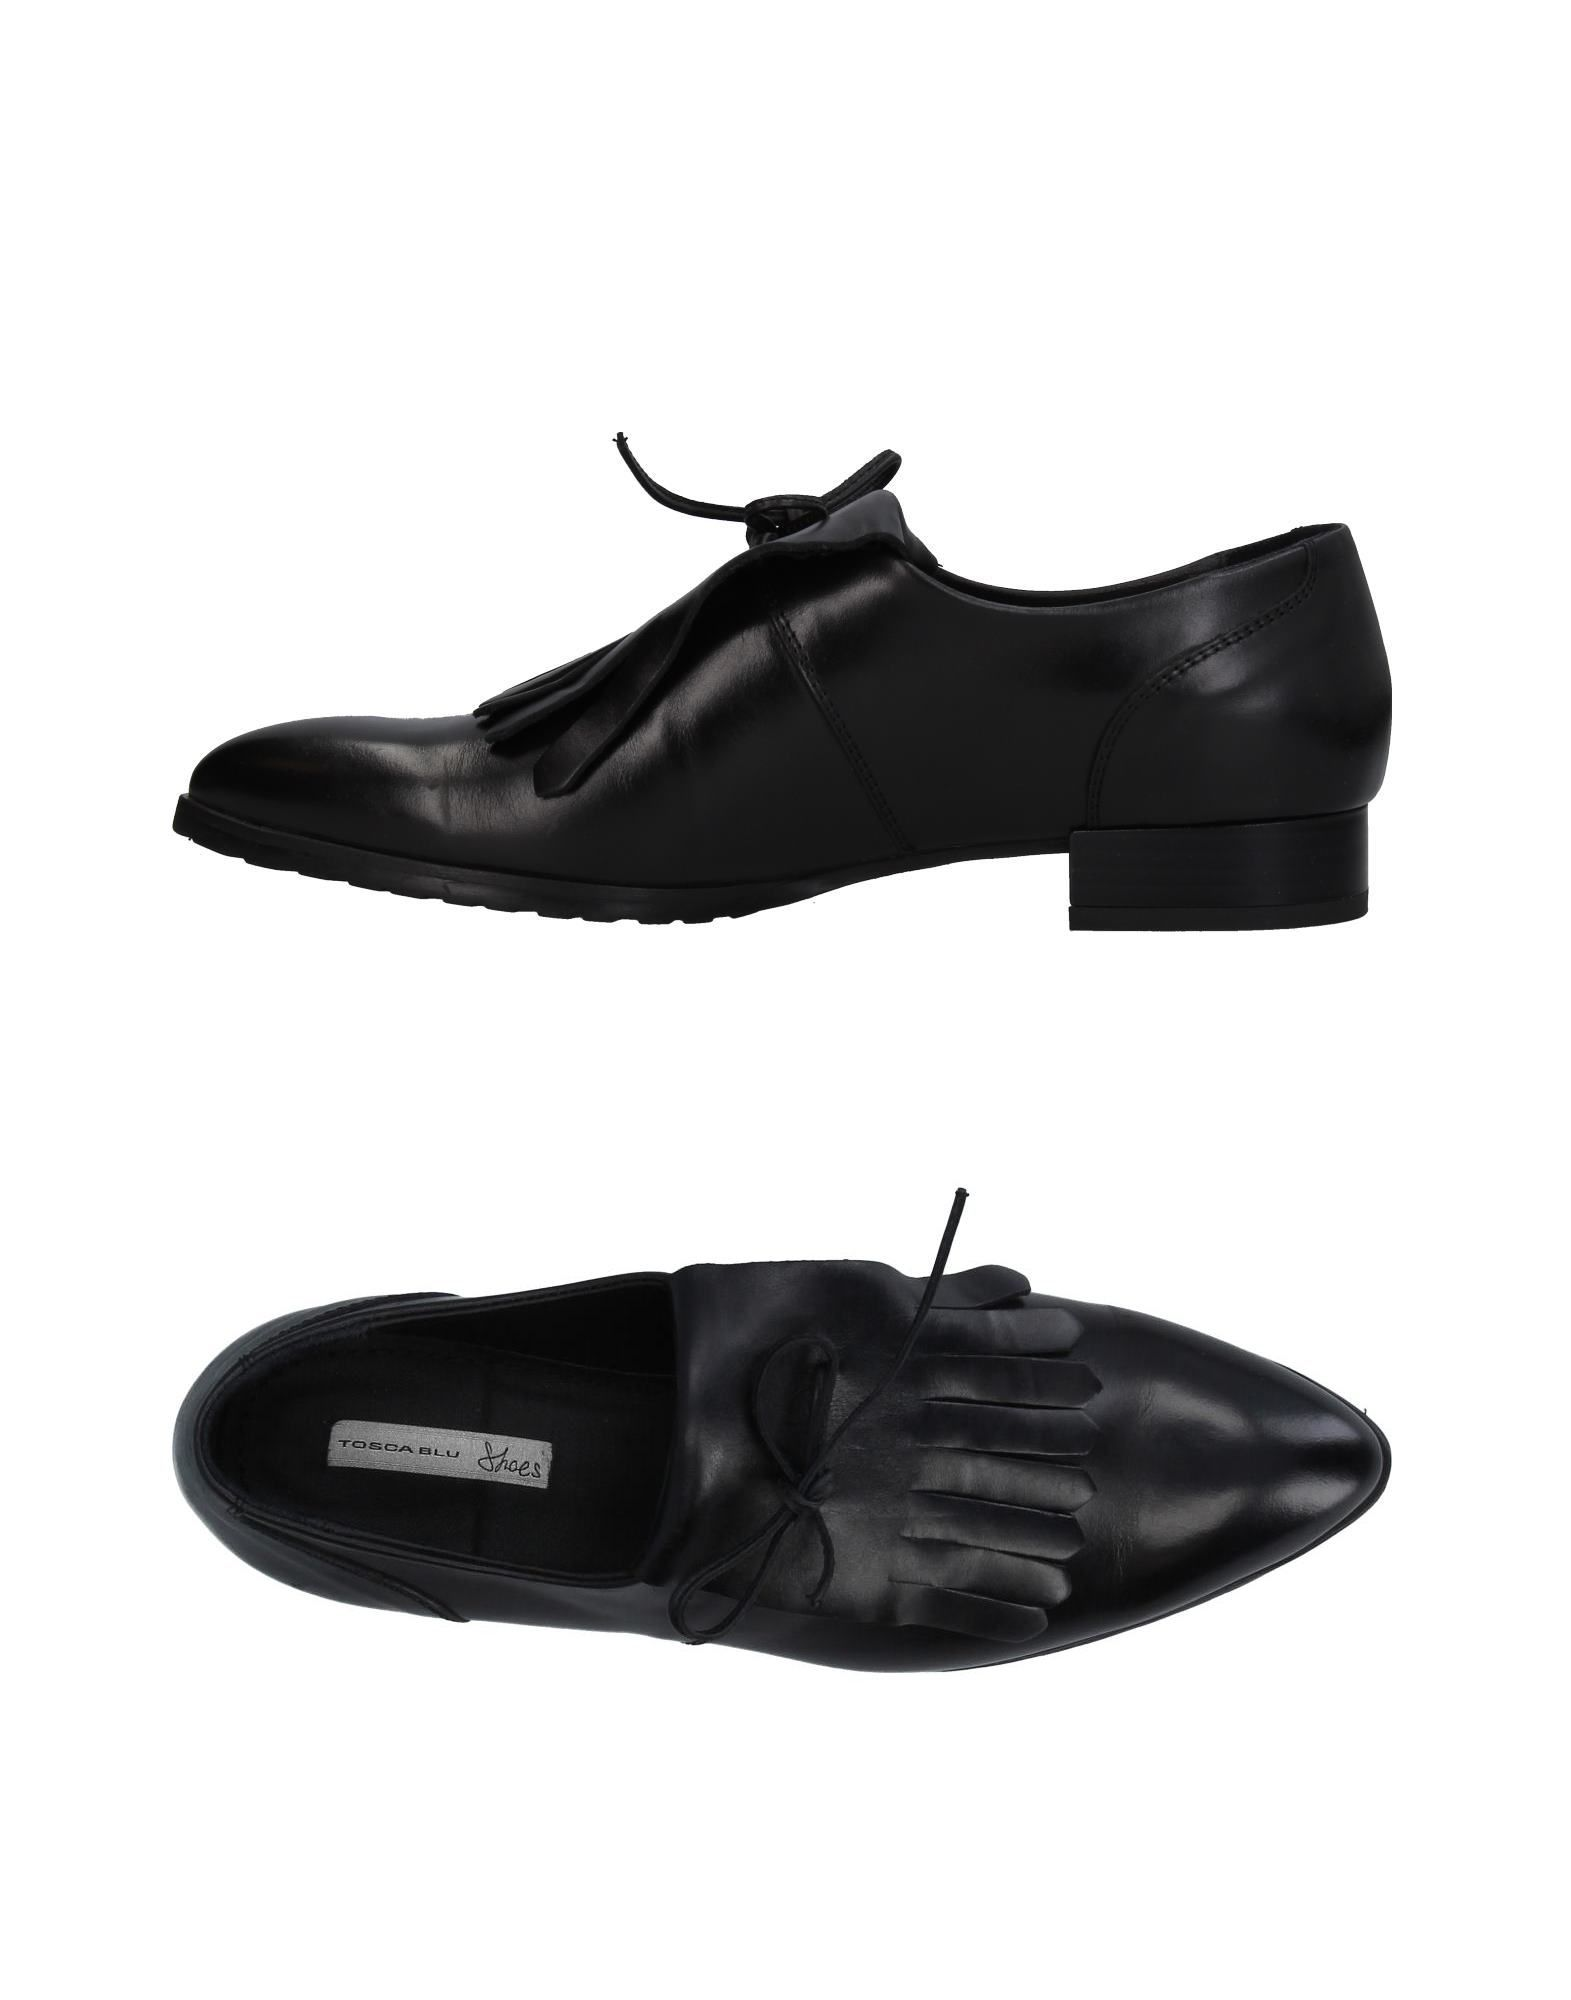 Фото - TOSCA BLU SHOES Мокасины women high heel shoes platform pumps woman thin high heels party wedding shoes ladies kitten heels plus size 34 40 41 42 43